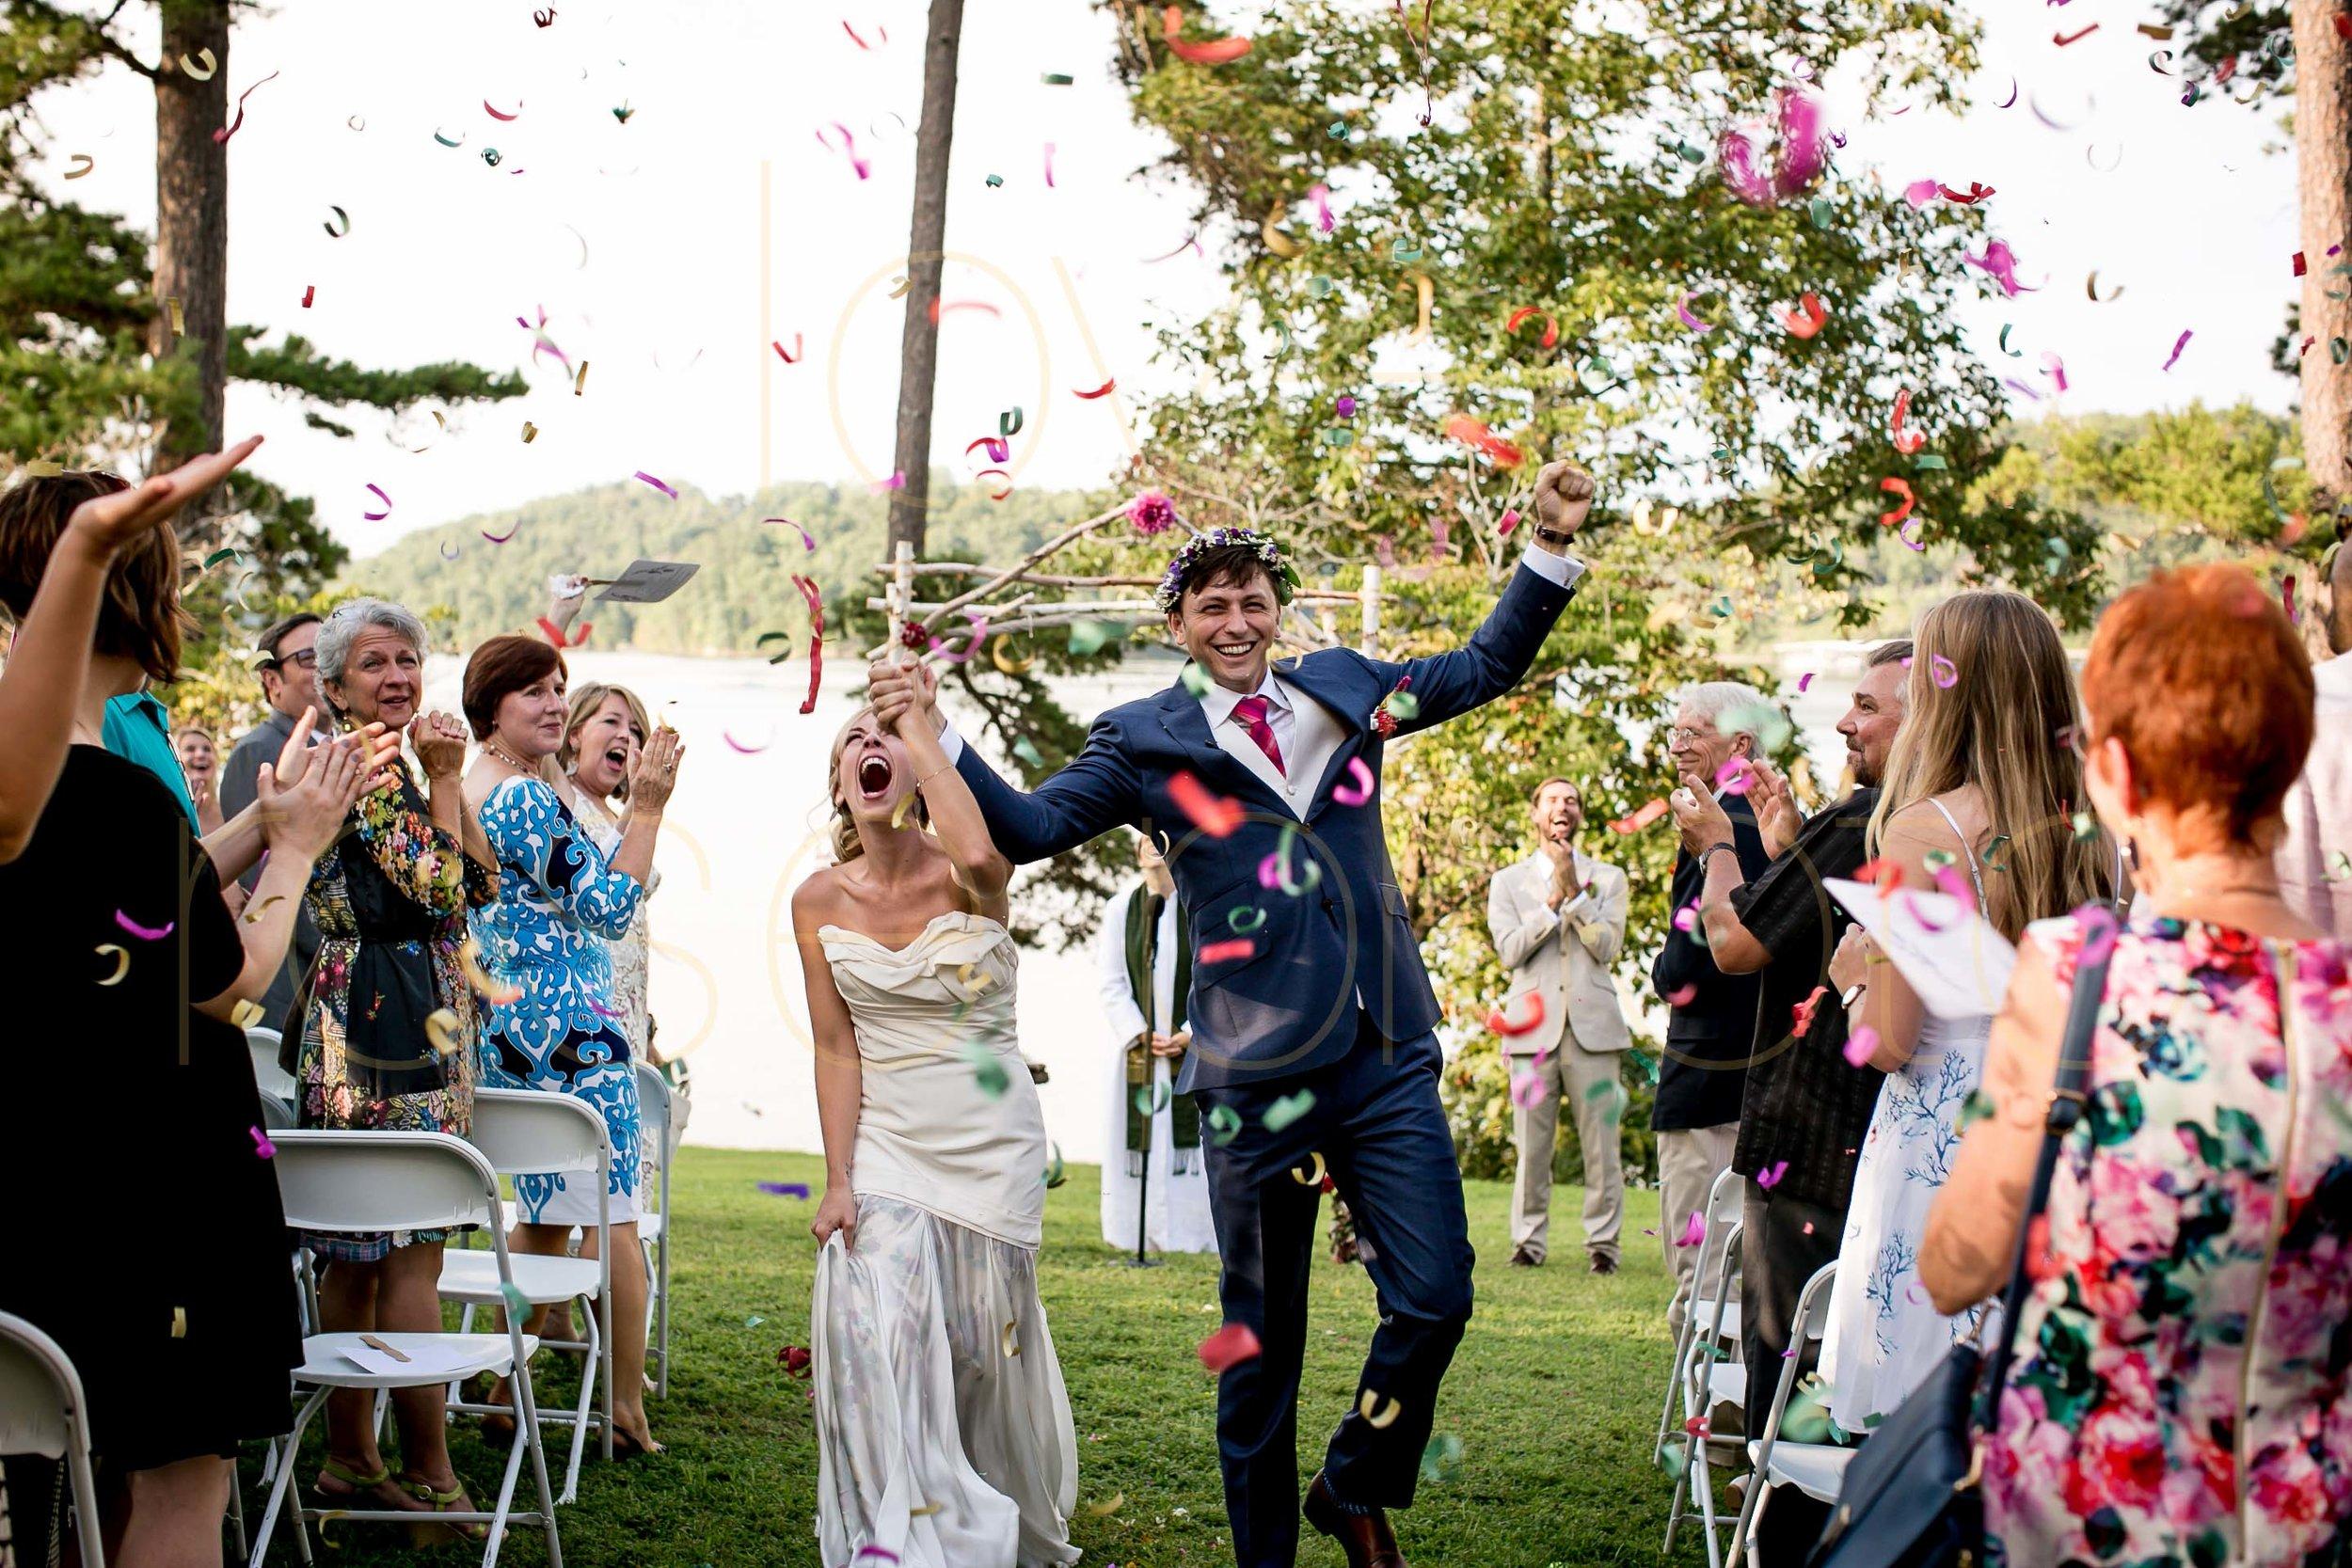 Rose Photo Asheville Wedding Photographer Nasheville Weddings Charleston Bride Chicago photojournalist weddings -43.jpg